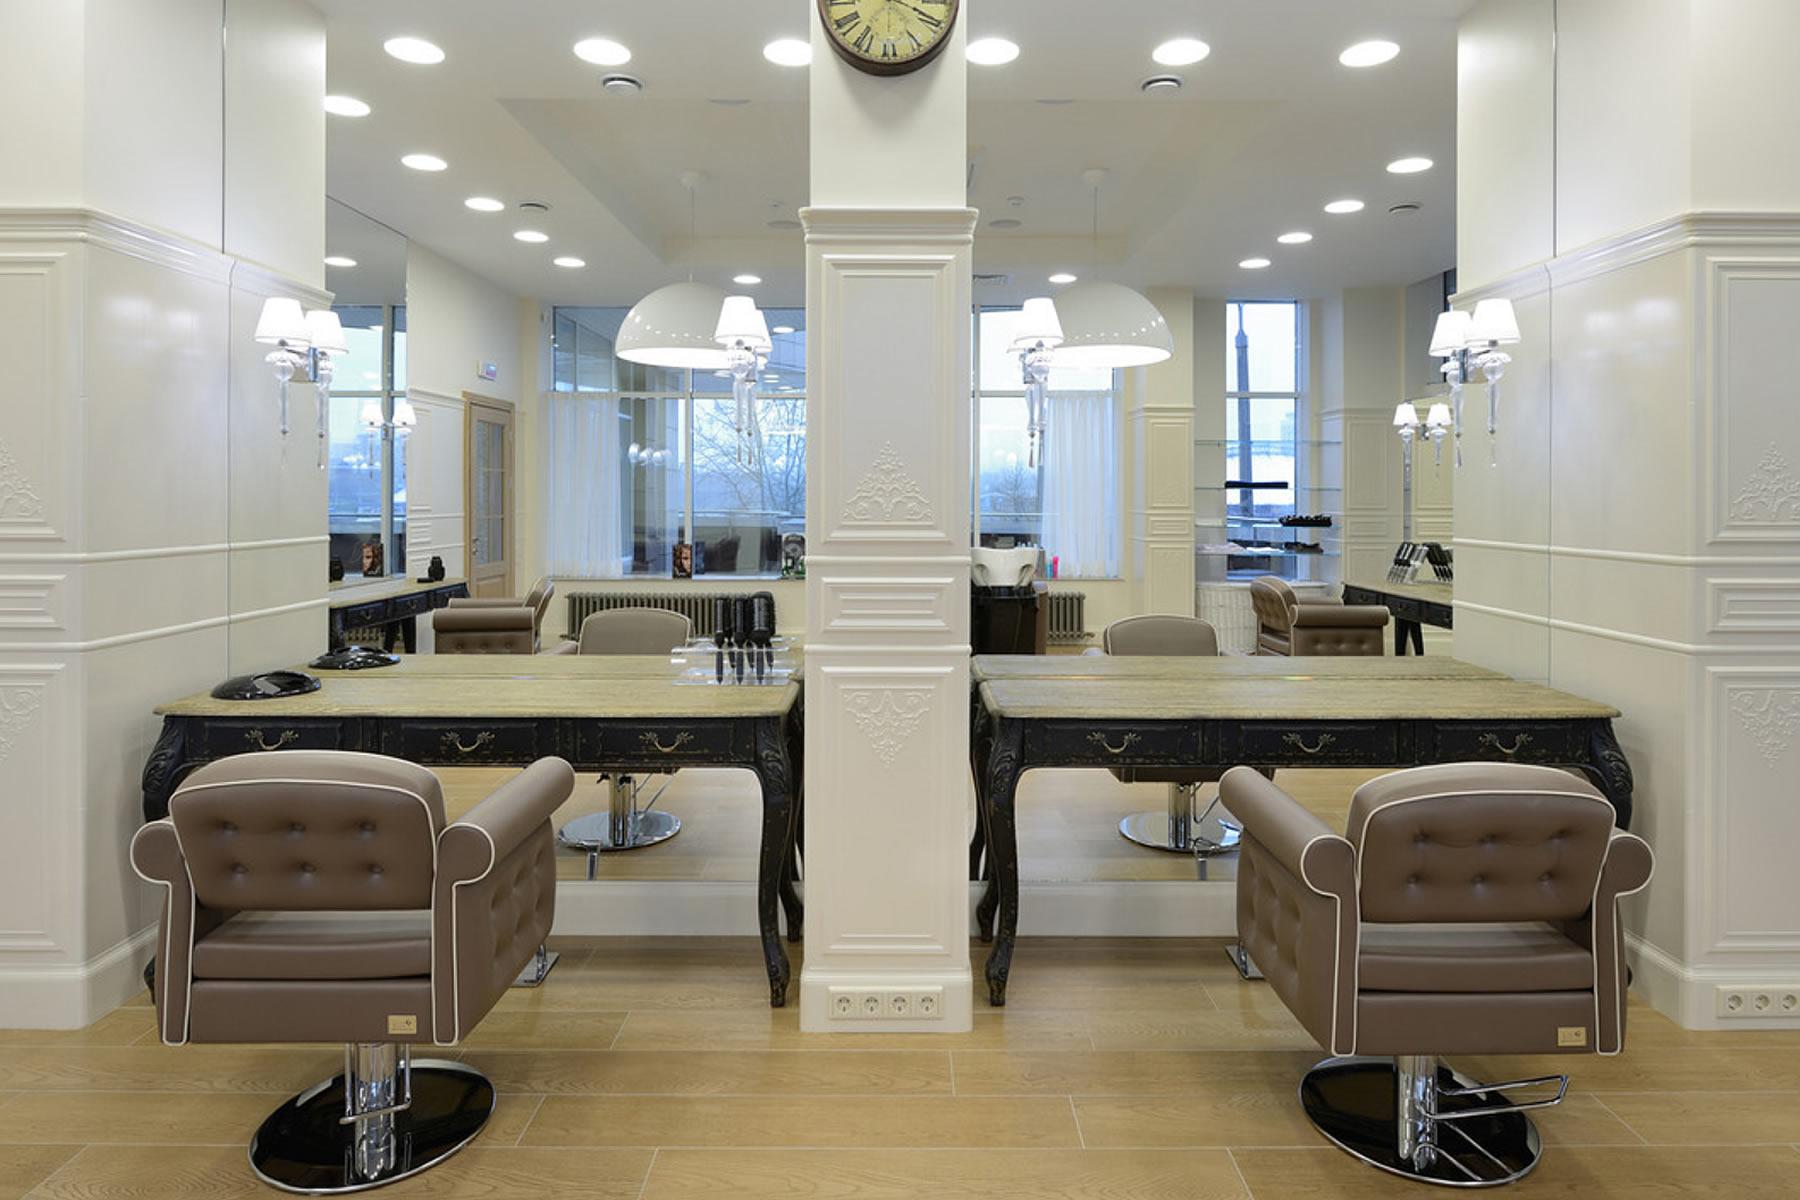 Idea arredo arredamento parrucchieri e centri estetitici for Arredamenti per parrucchieri economici